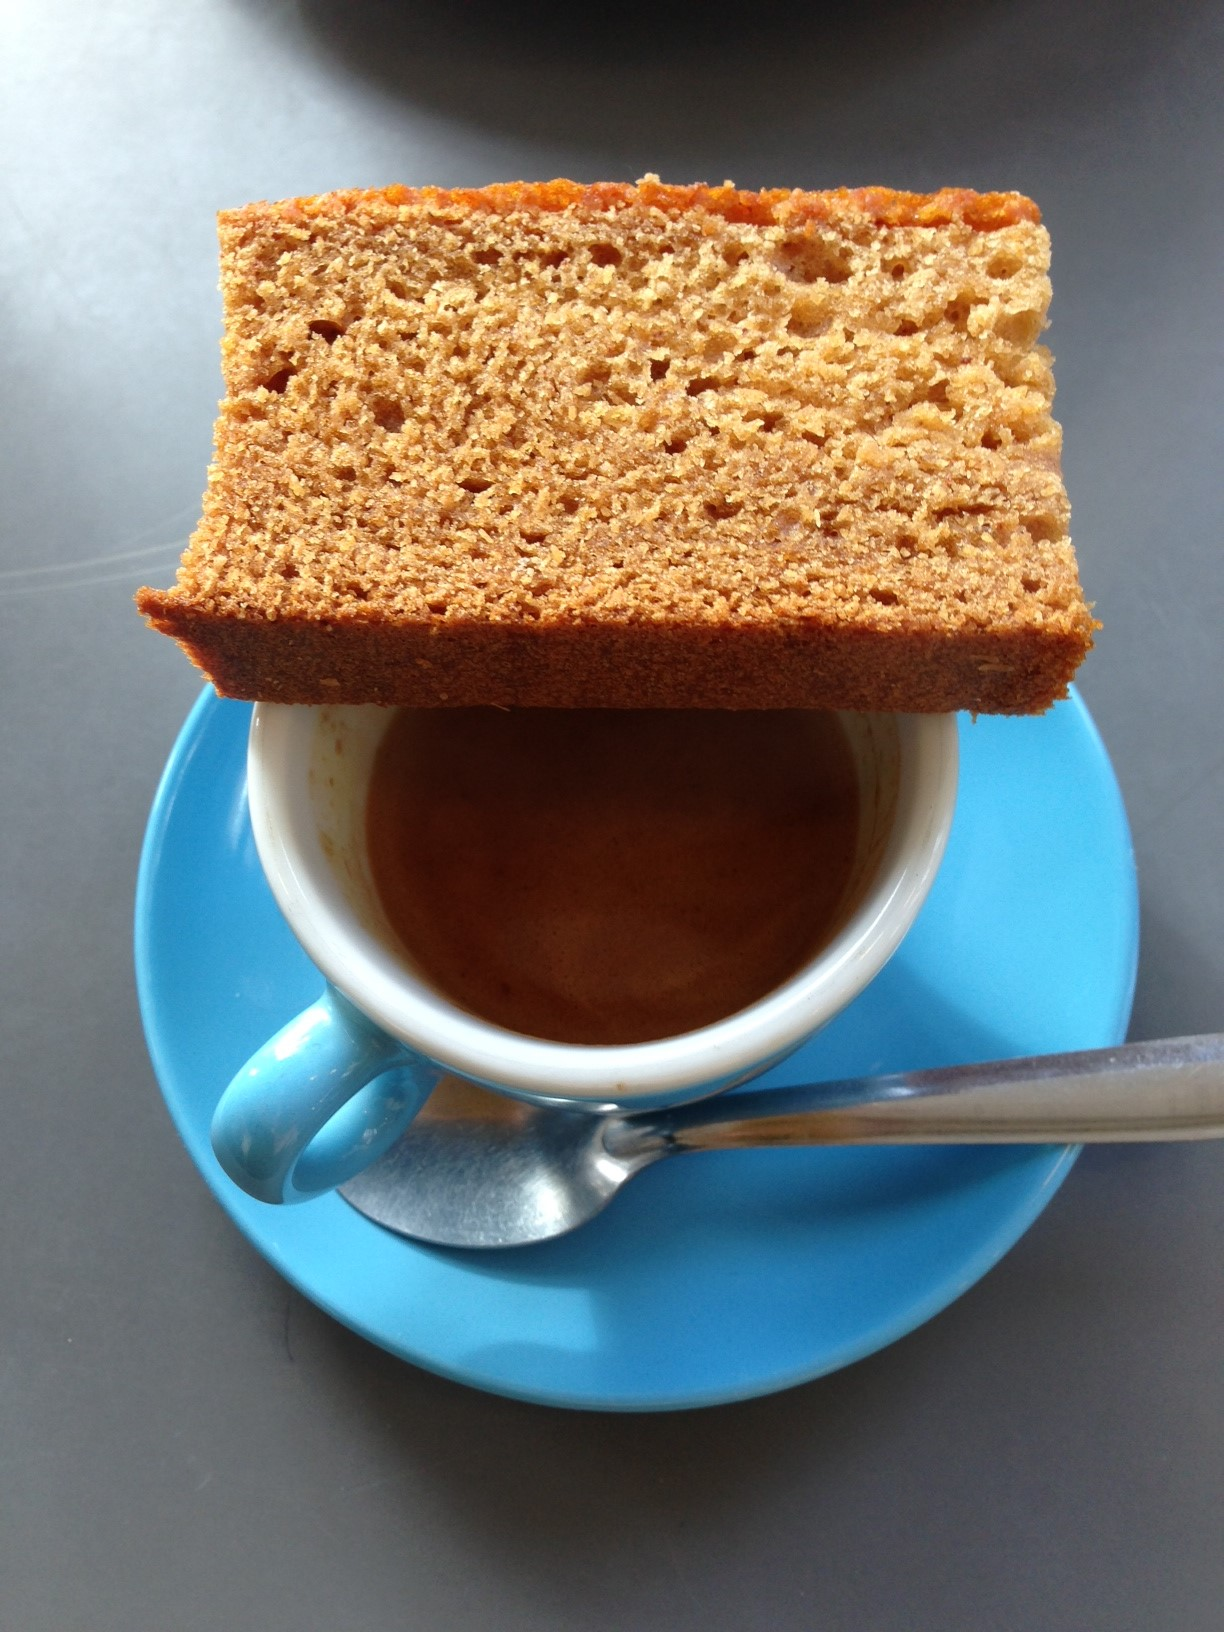 Good coffee places in paris